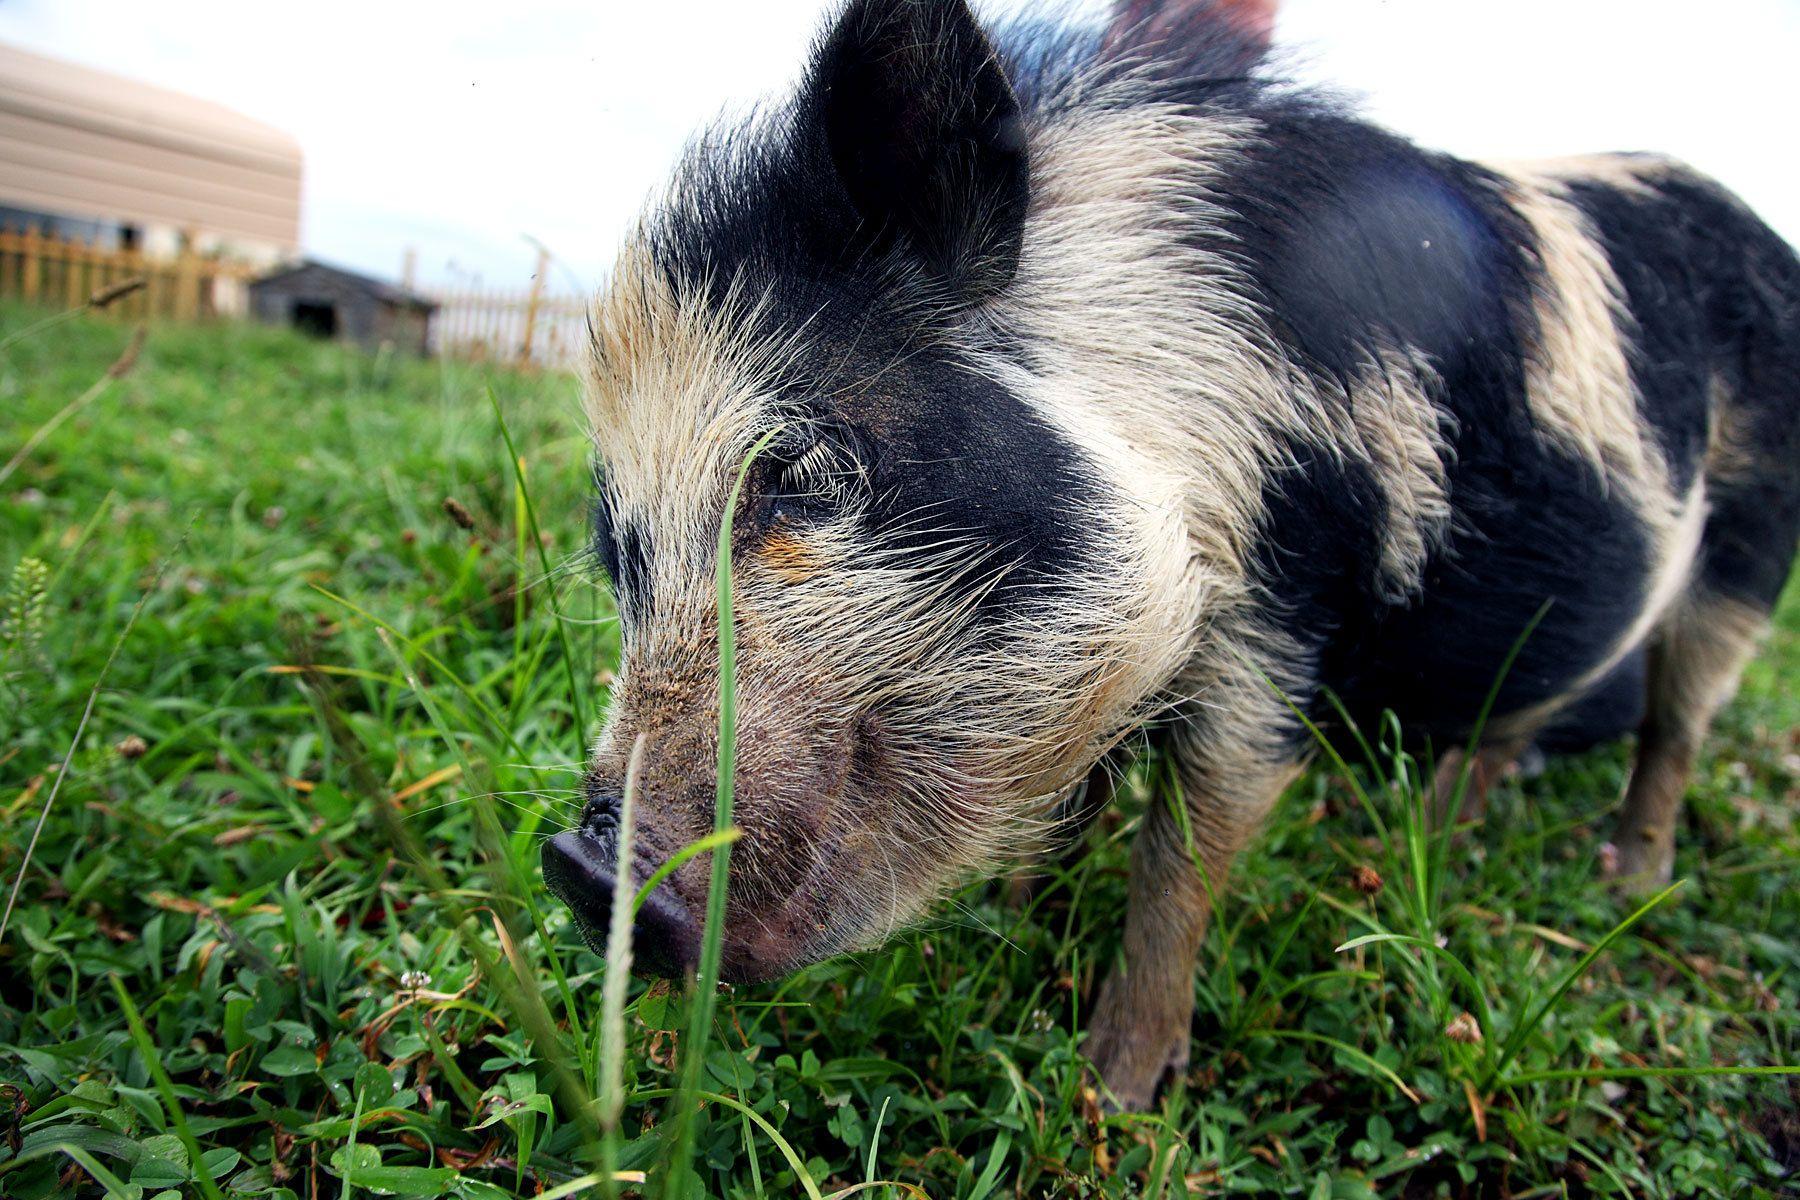 Peaceful Pig